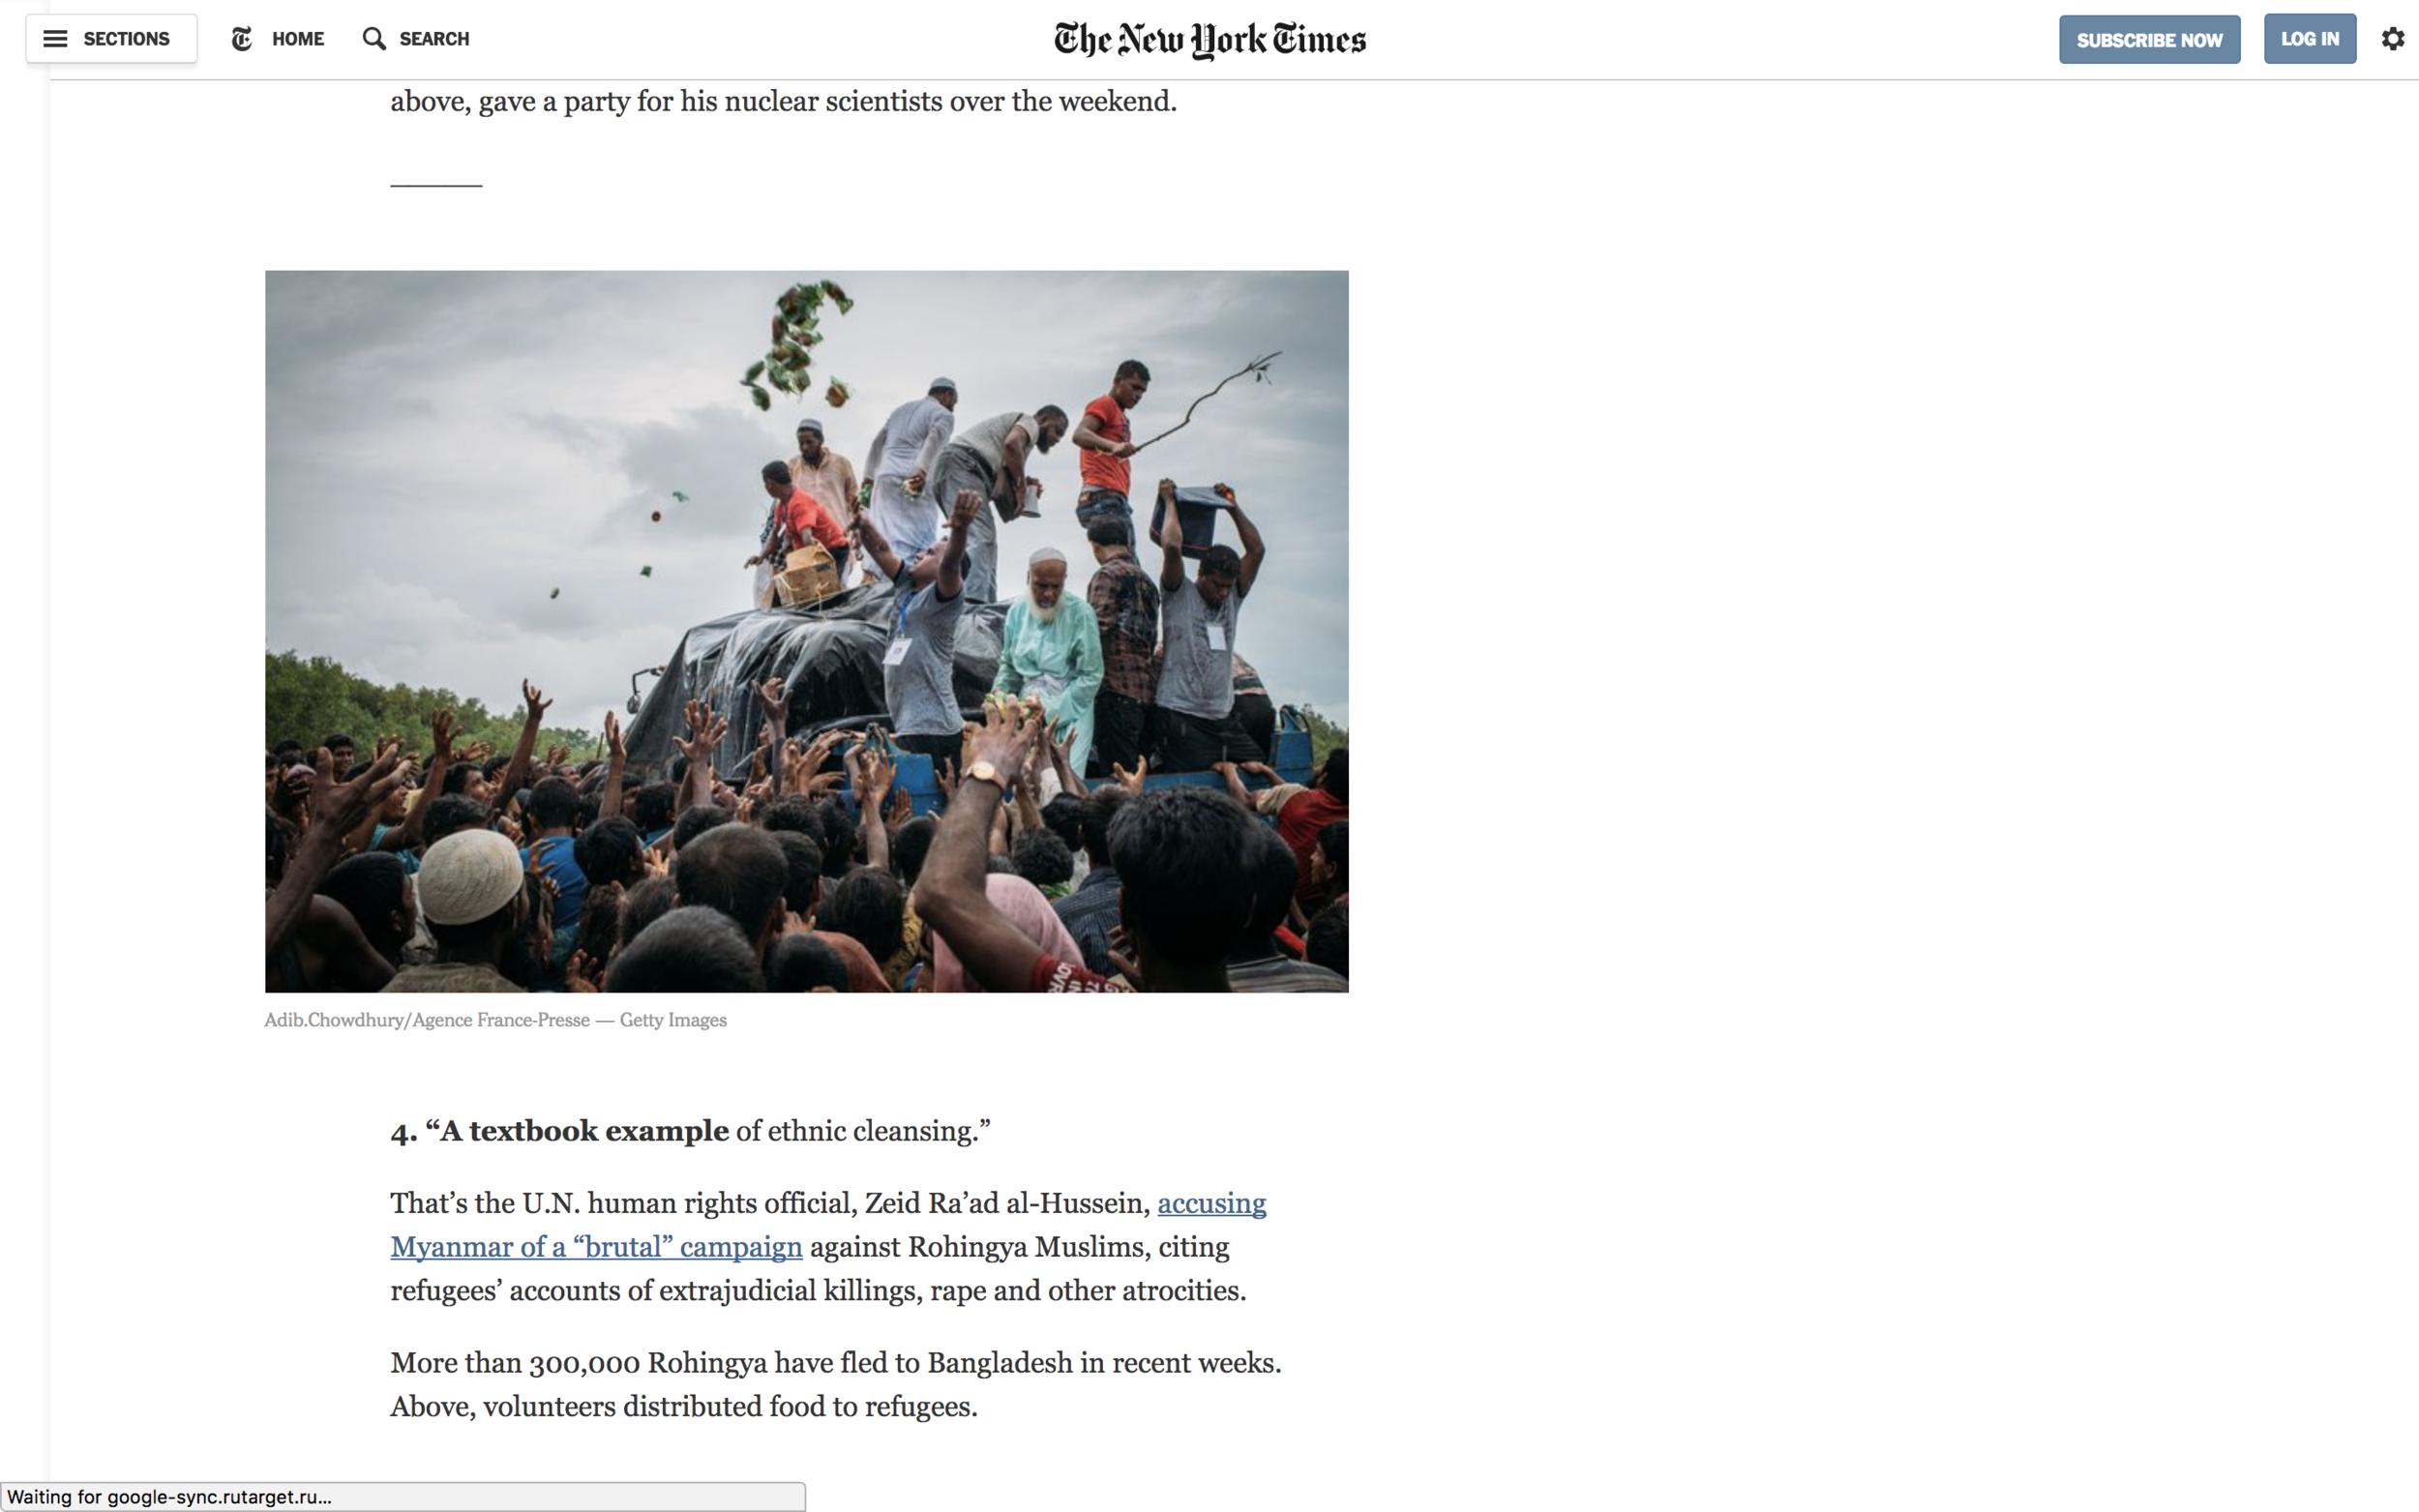 New York Times, Sept. 2017